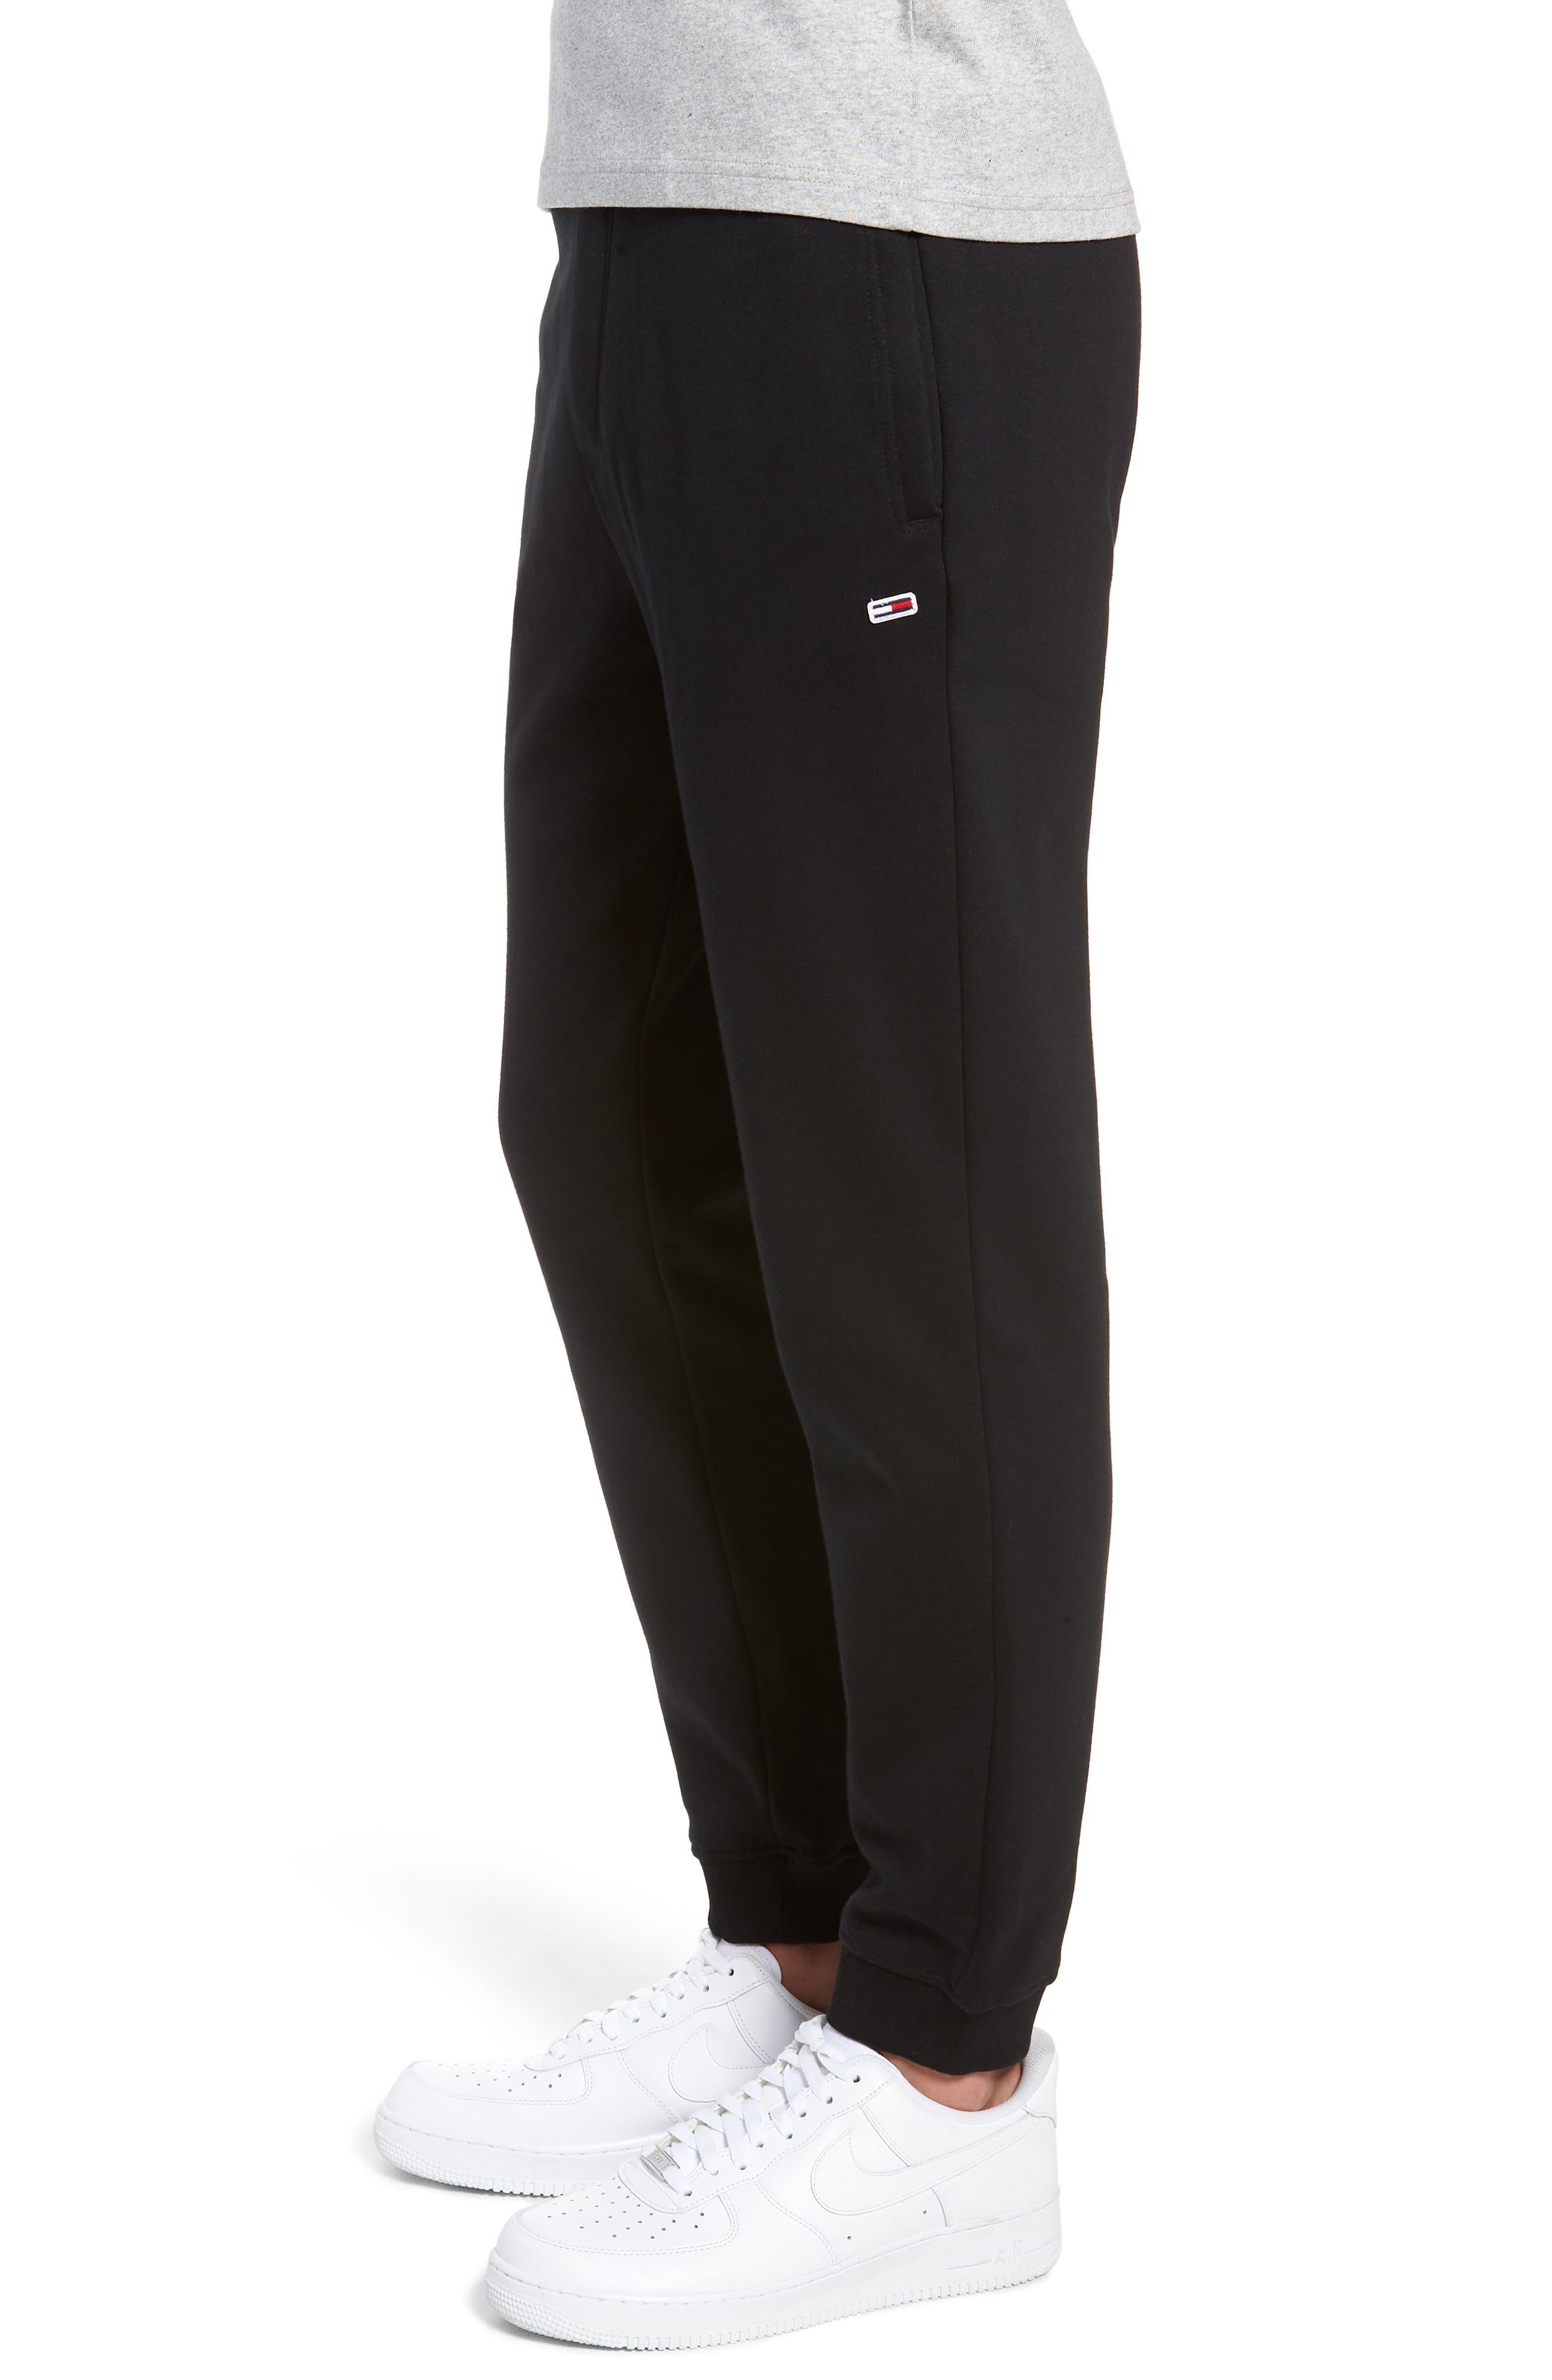 TJM Classics Sweatpants,                             Alternate thumbnail 3, color,                             TOMMY BLACK